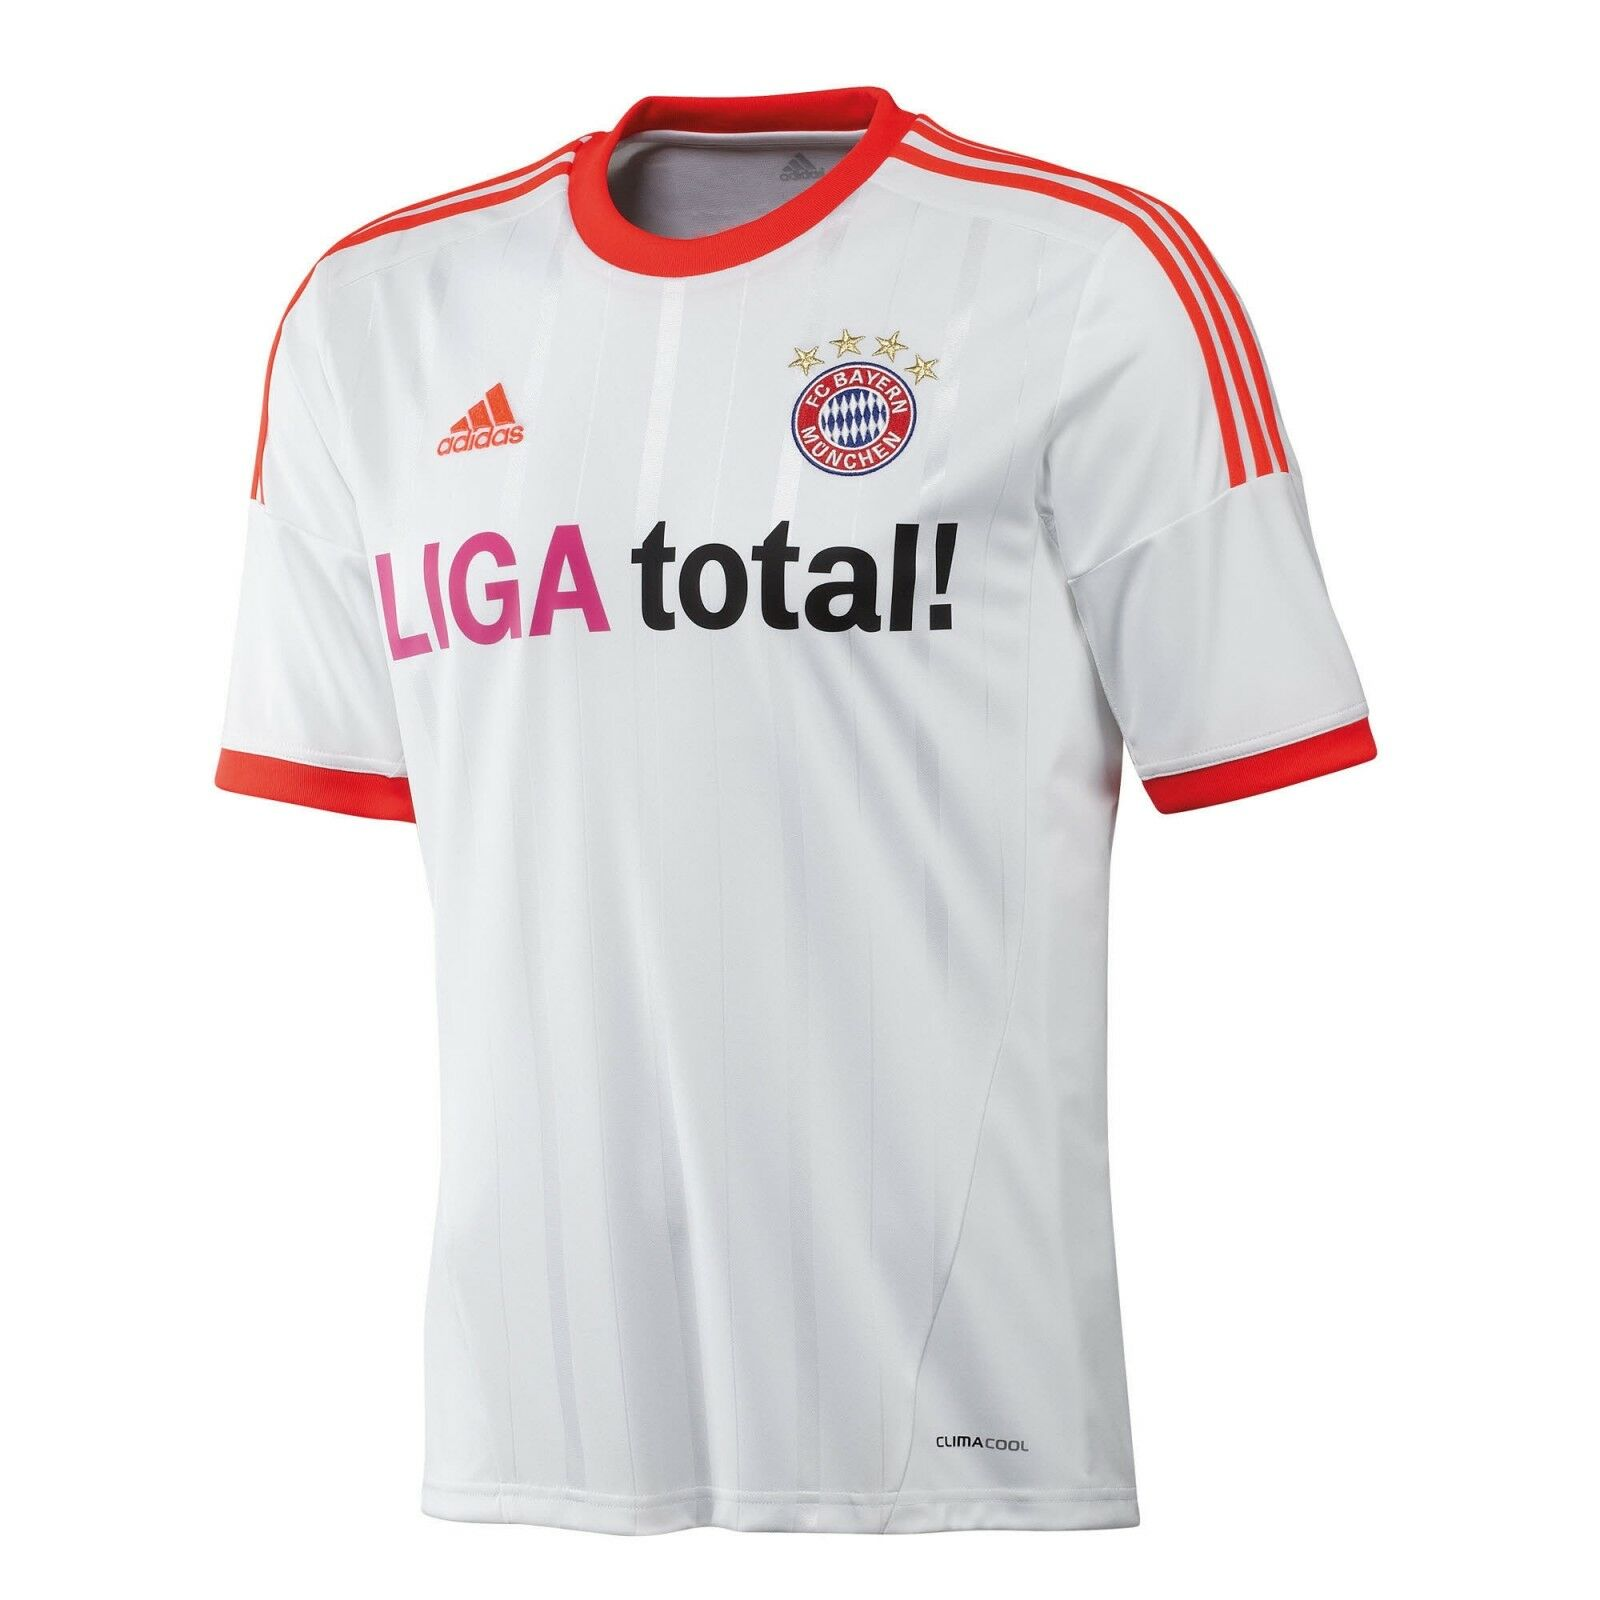 Trikot Adidas Triple FCB Away 2012 2013 München Bayern FC